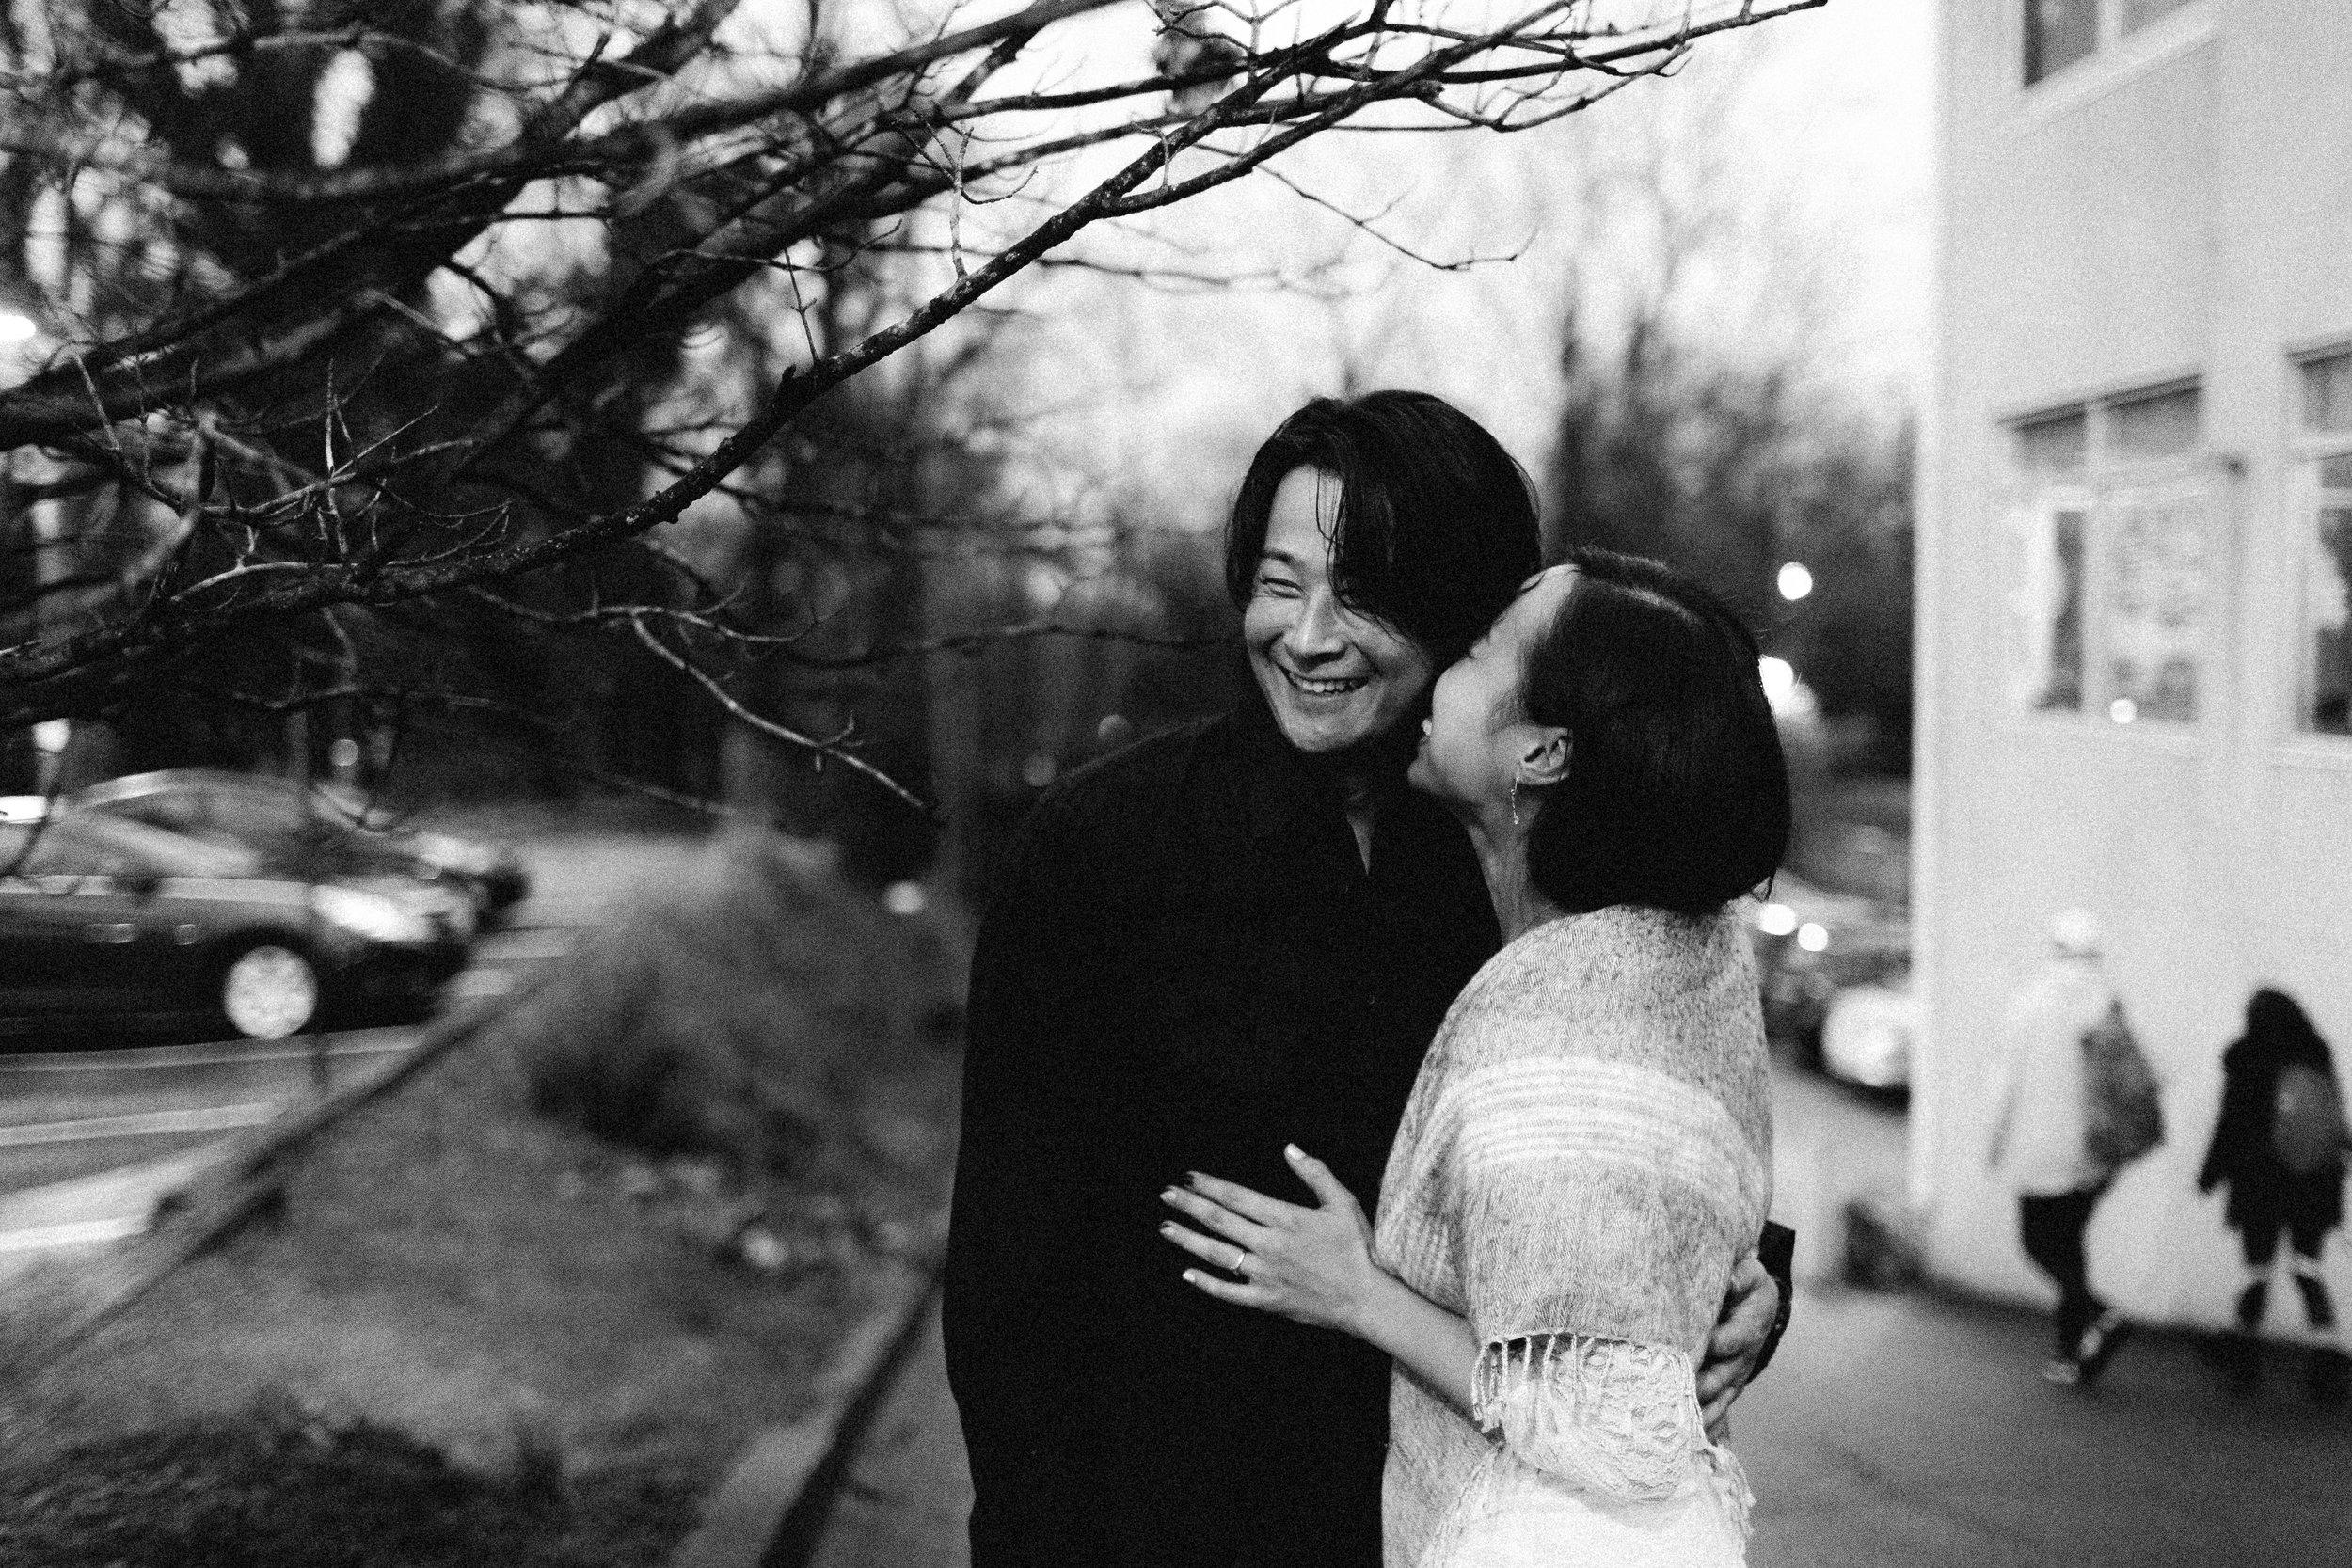 atlanta_gloomy_day_rainy_engagement_couple_lifestyle_fun_playful_artistic_georgia_photographer_2219.jpg